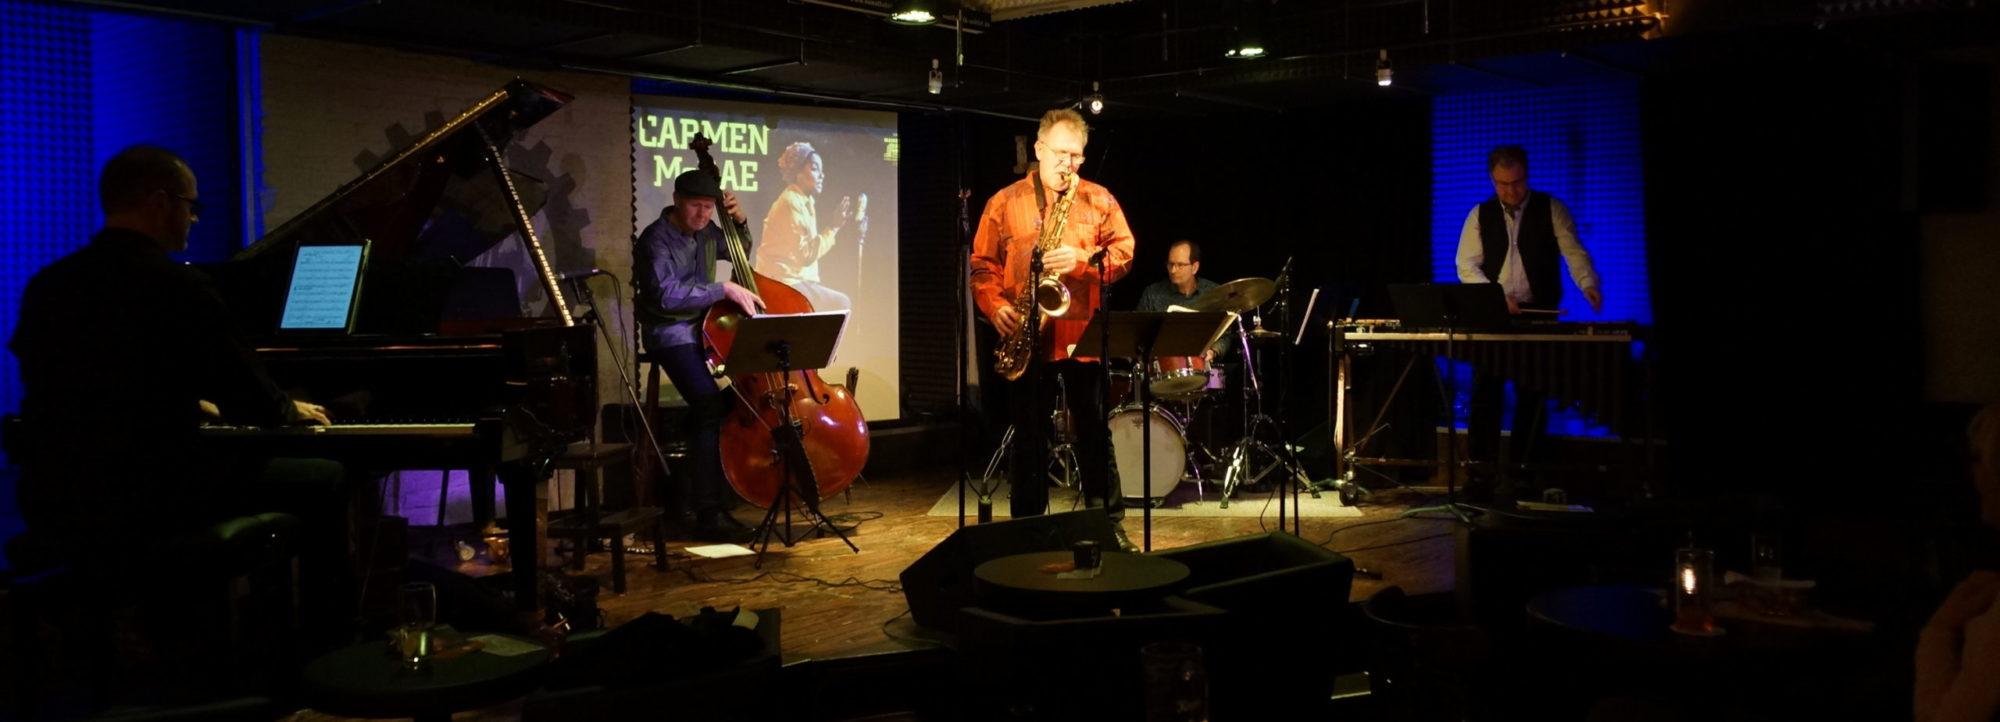 Uwe Dohnt - Saxophon : Musiker & Lehrer